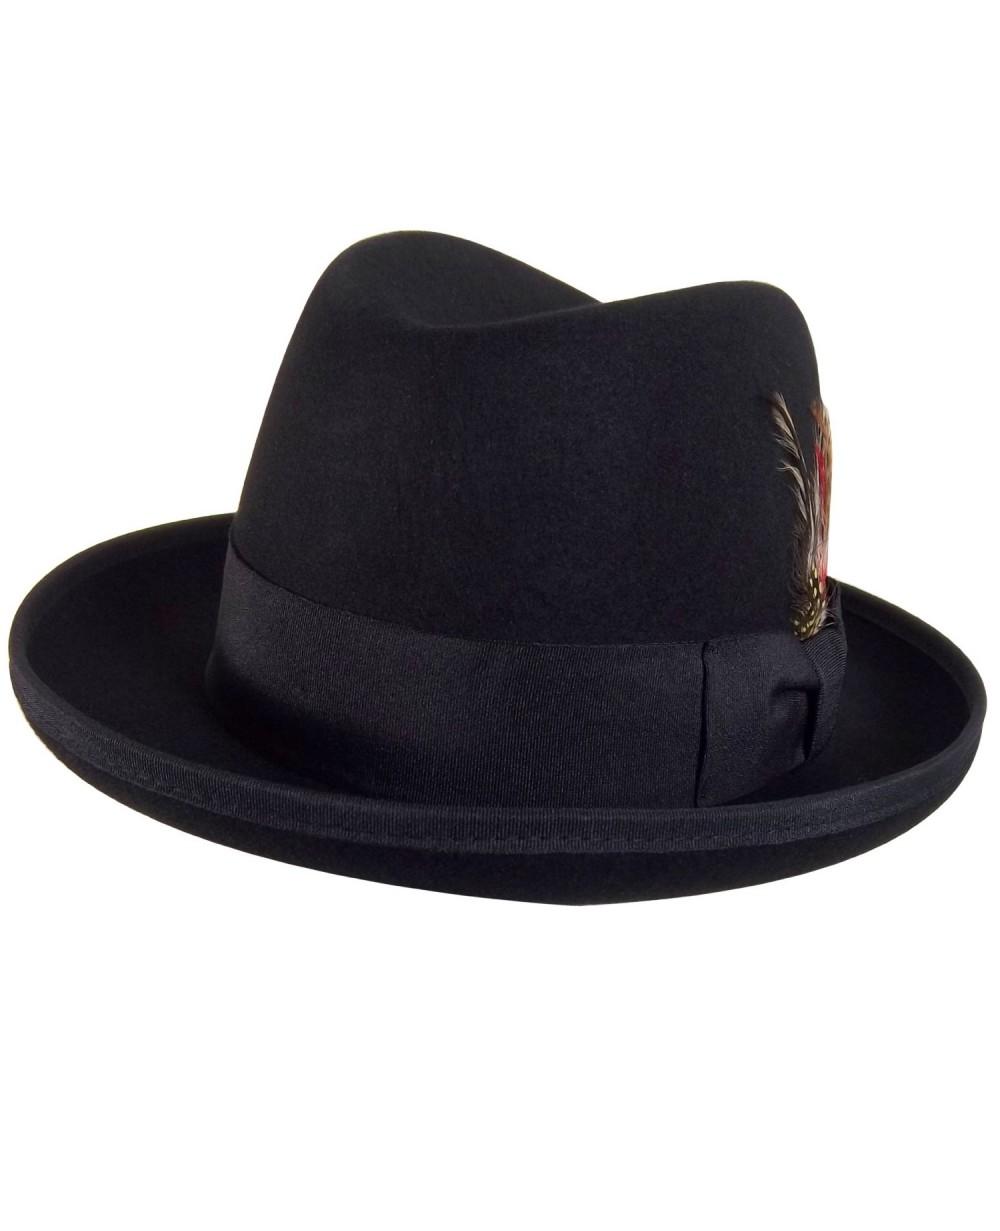 2501bbac958 Godfather Style Black Fedora Hat With Feathers